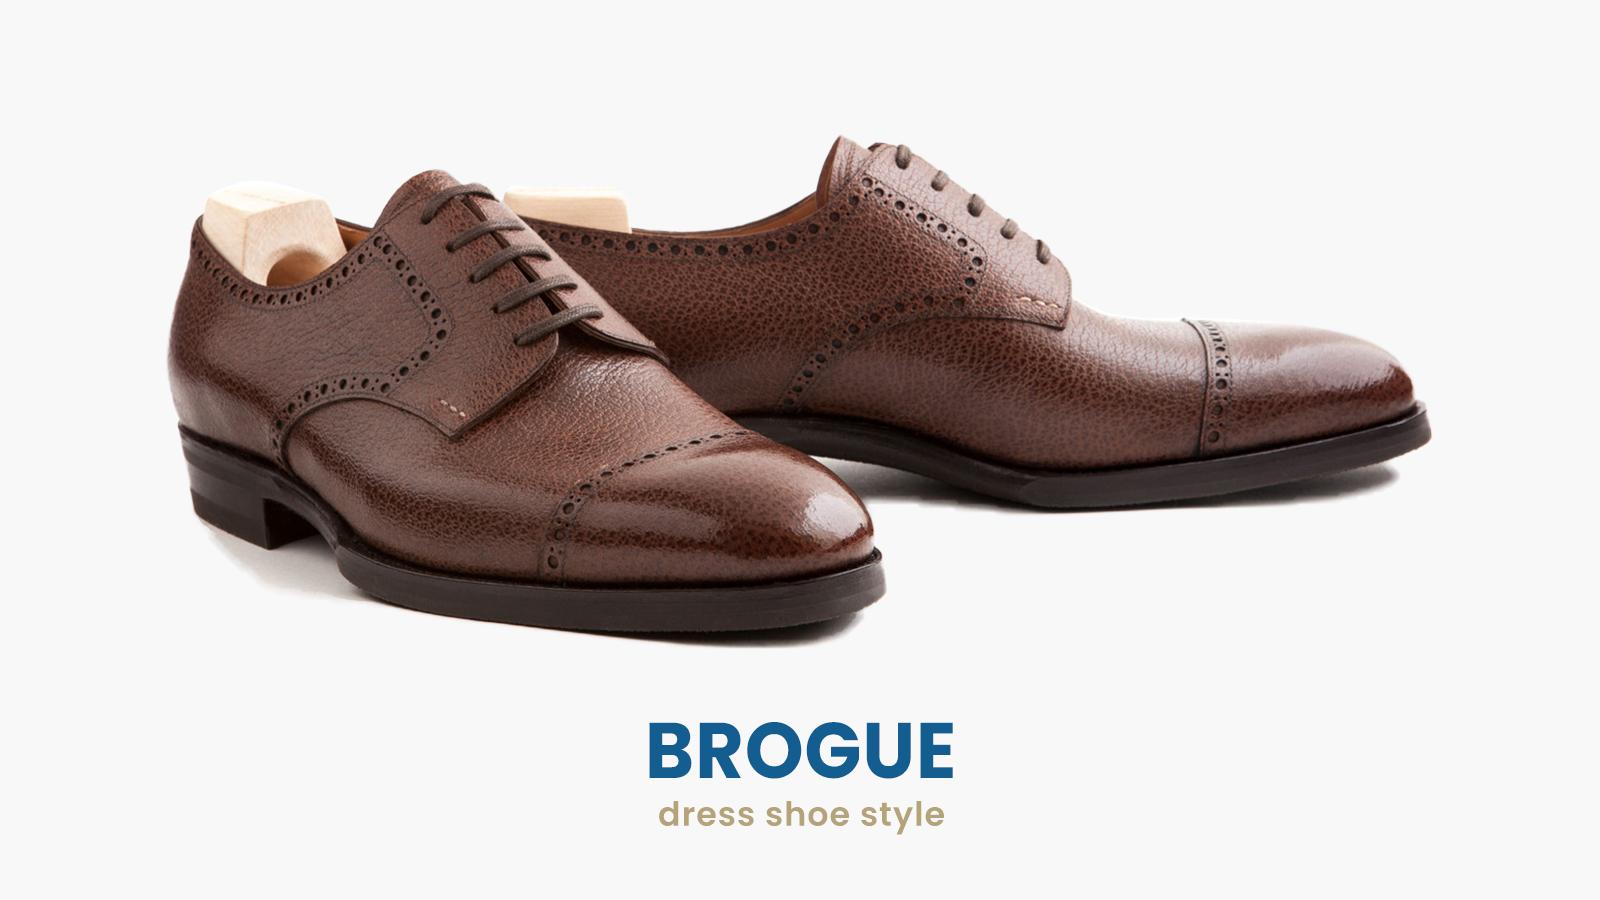 brogue dress shoes style